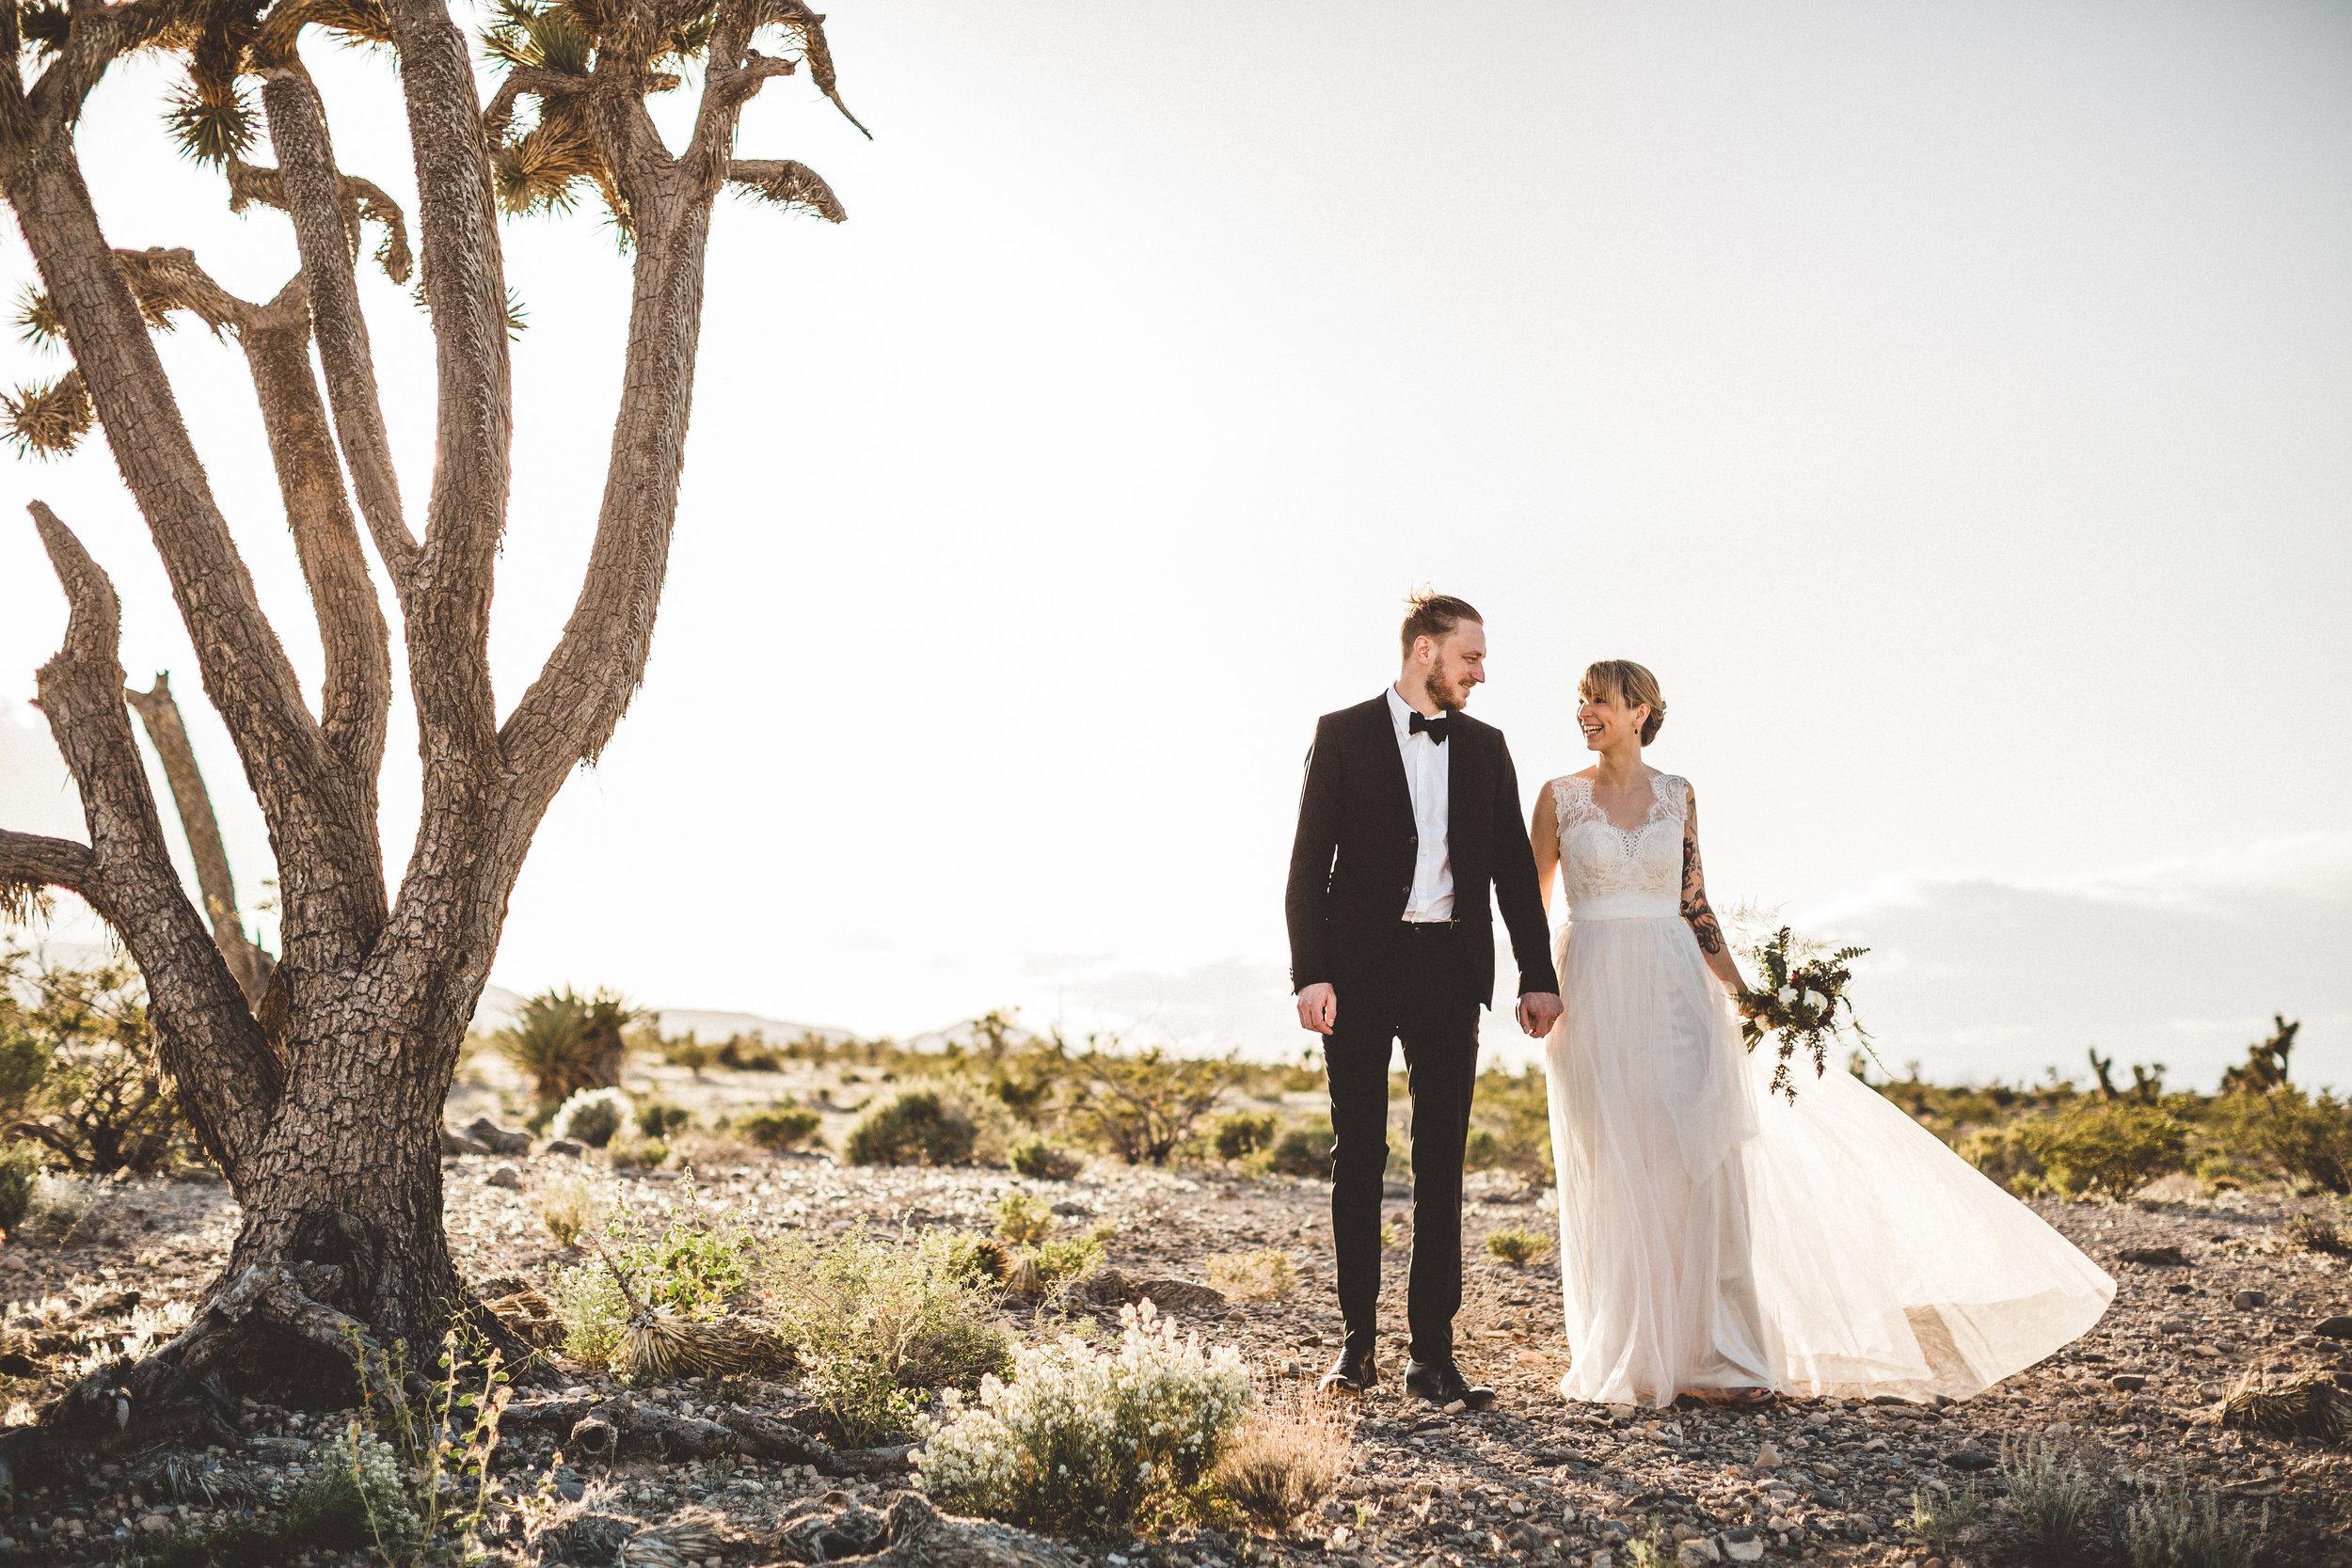 meike-and-rene-las-vegas-desert-elopement17.jpg